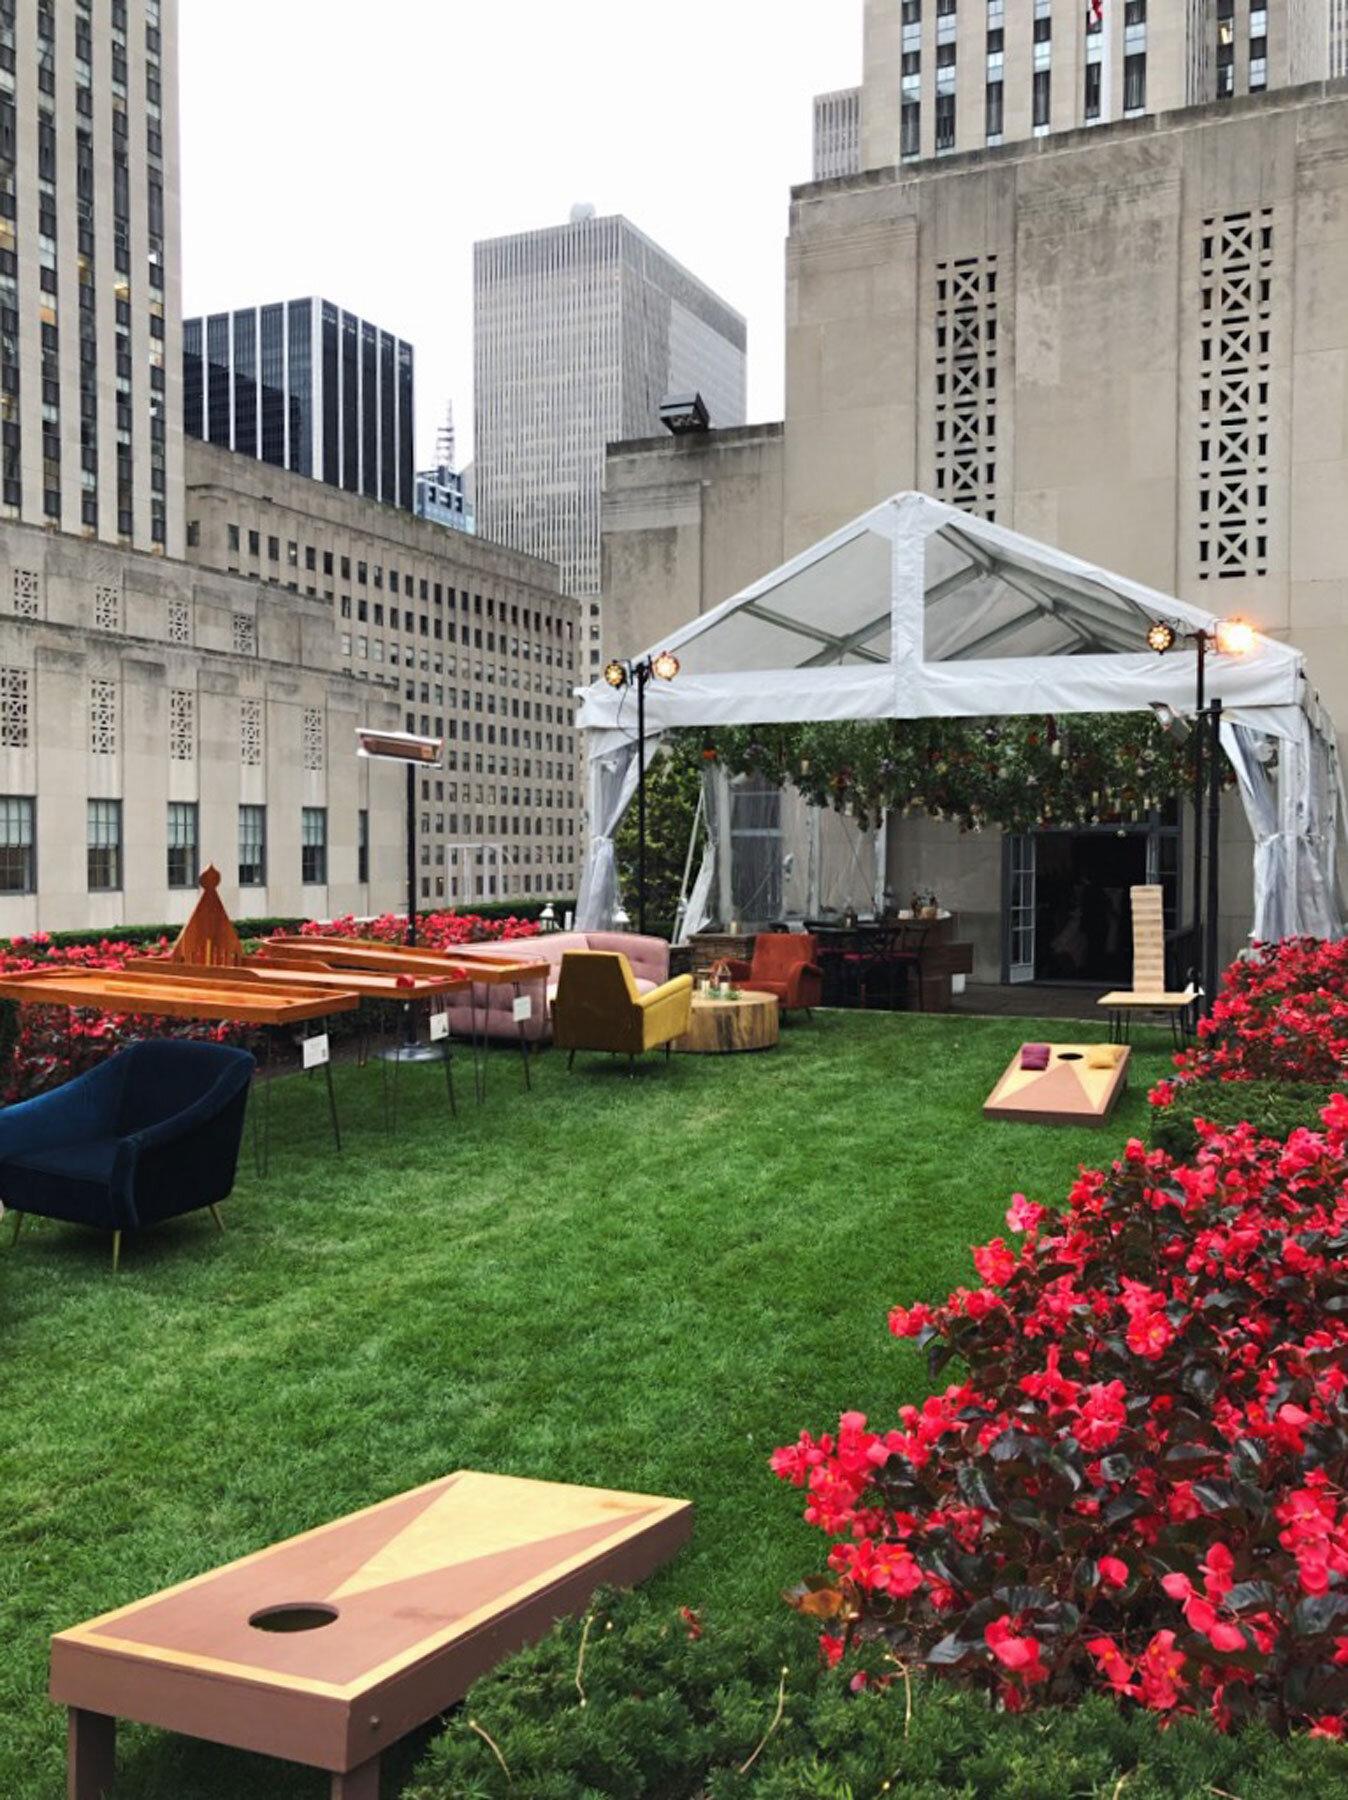 Rockefeller-Center-Wedding-Game-Rentals-Rooftop-Garden-Venue-620-Loft-&-Garden.jpg